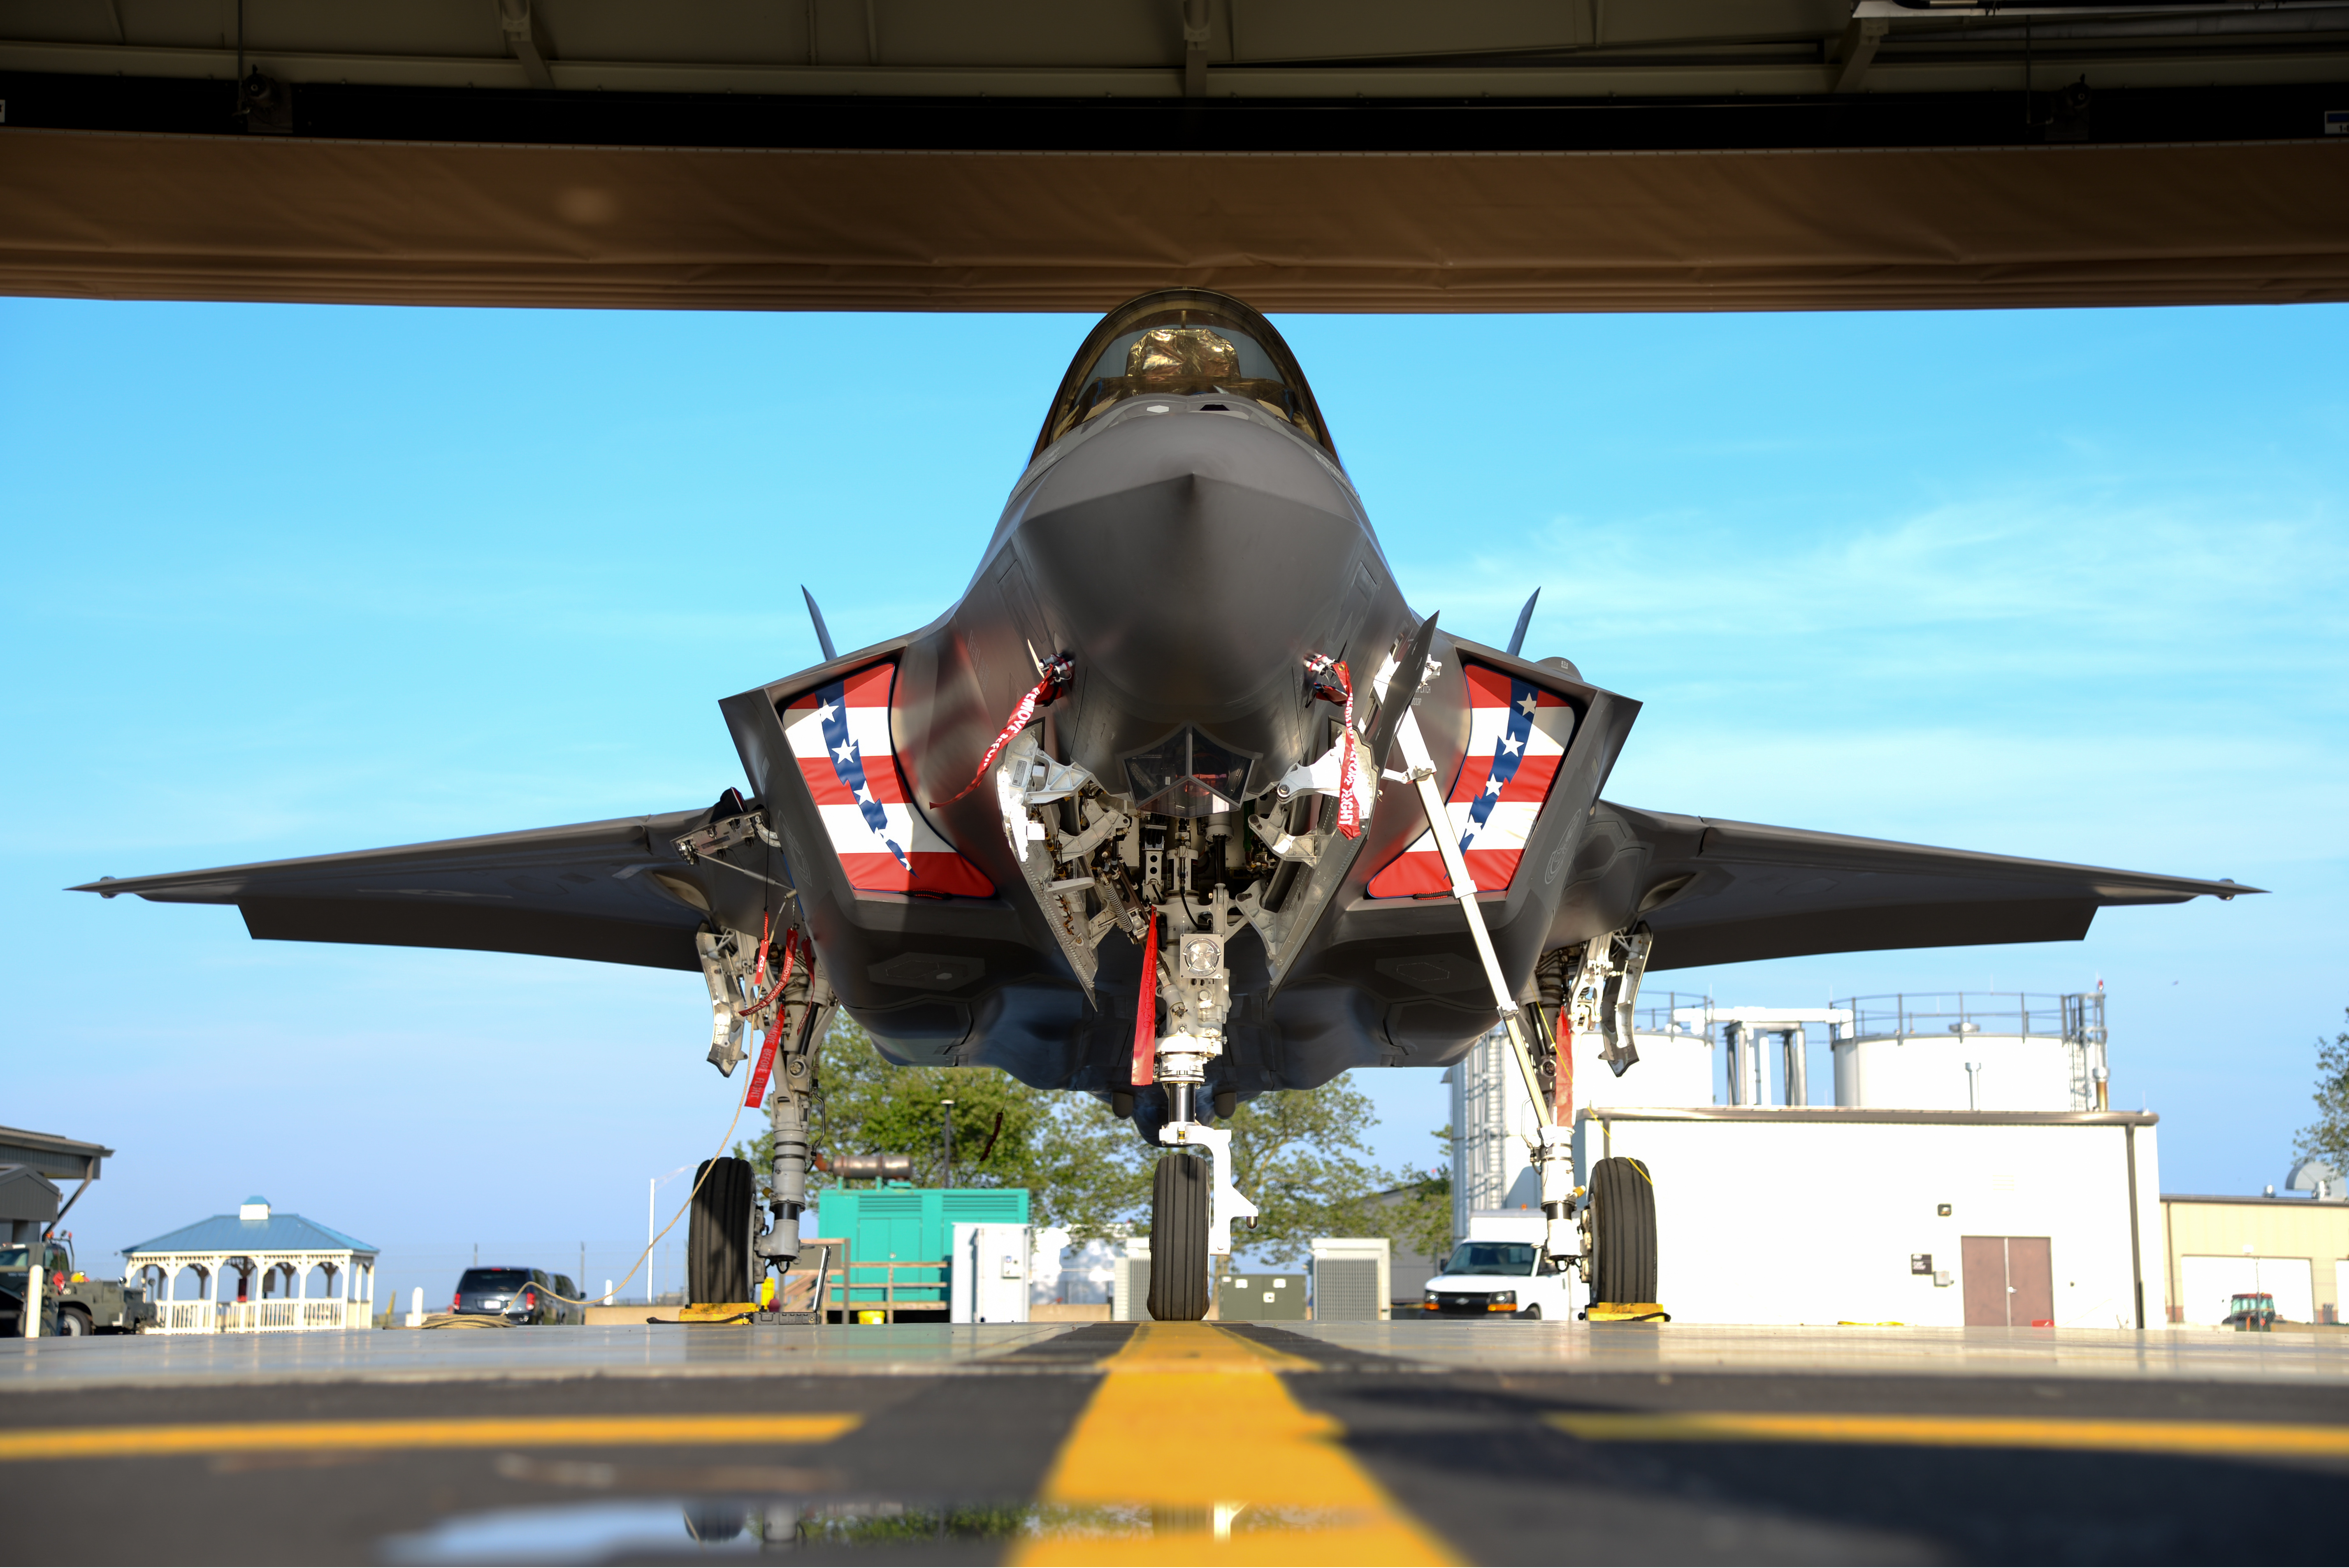 F 35 Lightining Ii Parked At Acy